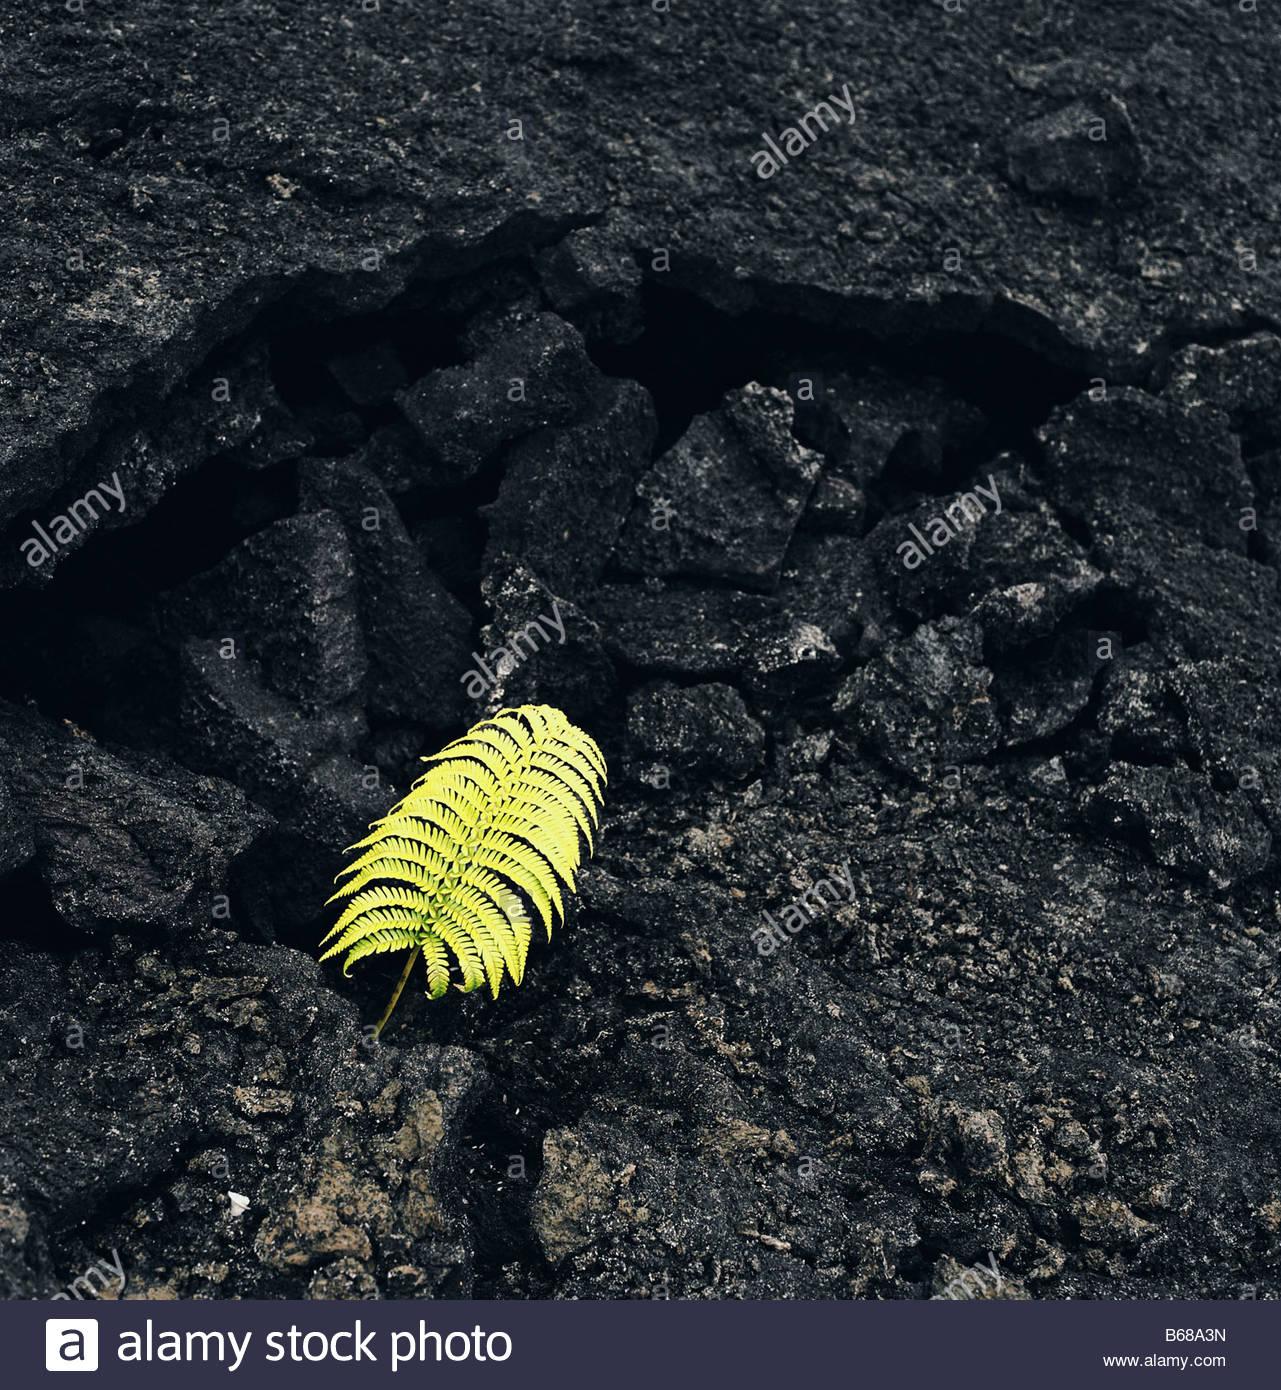 Single fern on rock formation - Stock Image